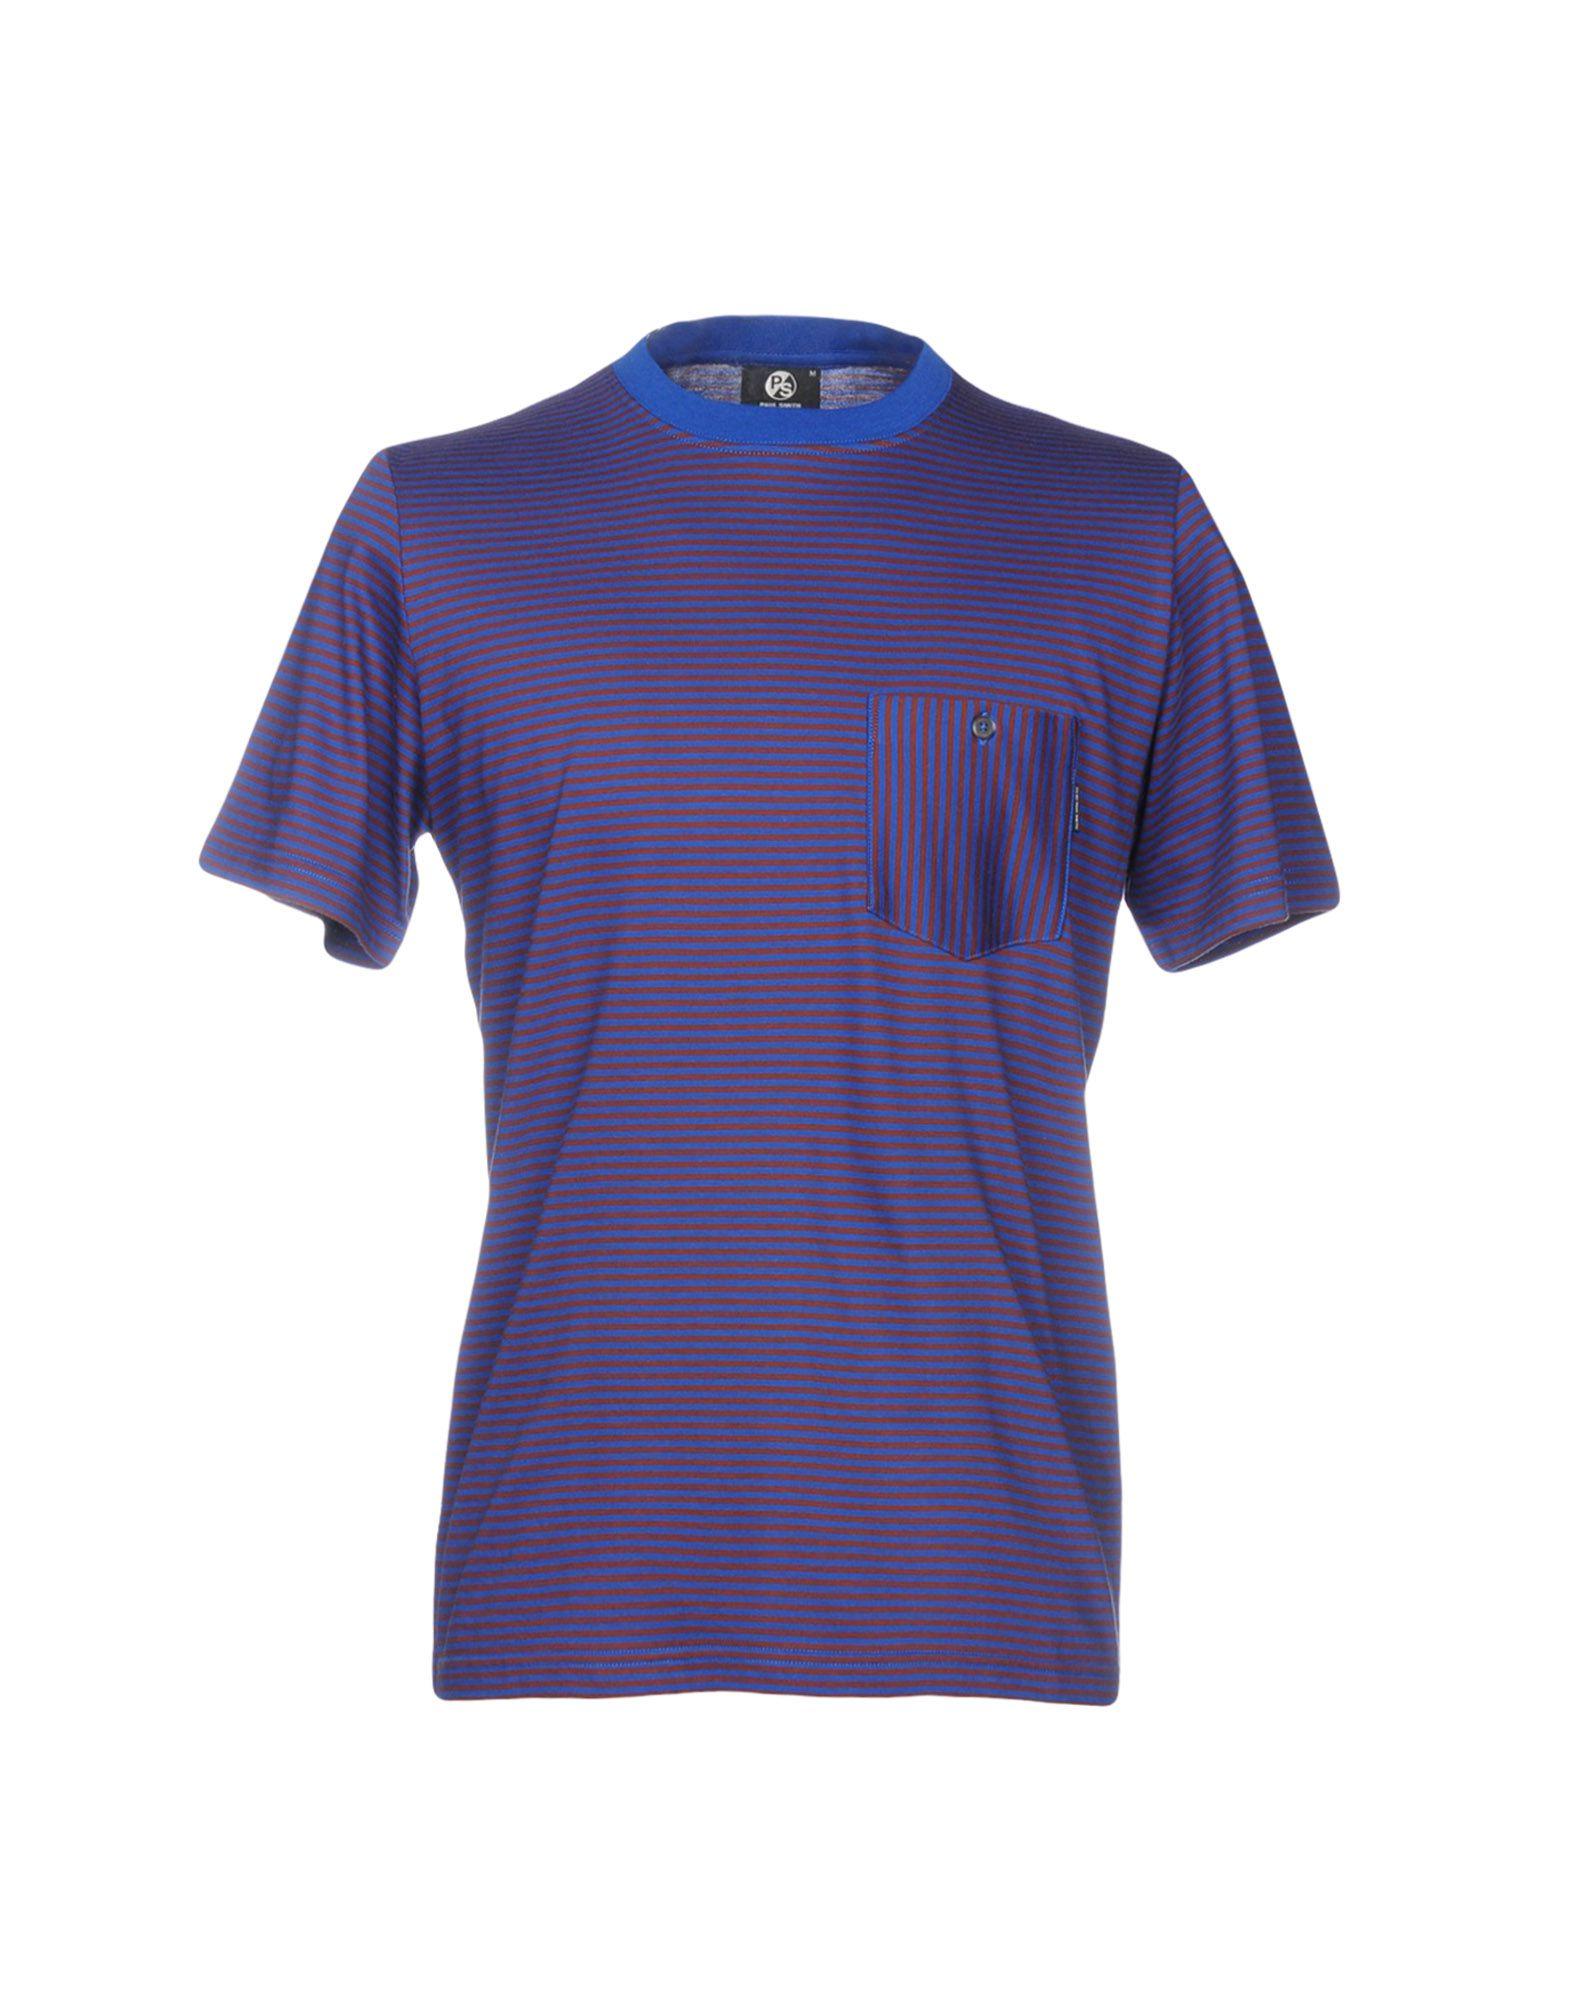 T-Shirt Paul Uomo Smith Uomo Paul - 12192921QK 9e4341